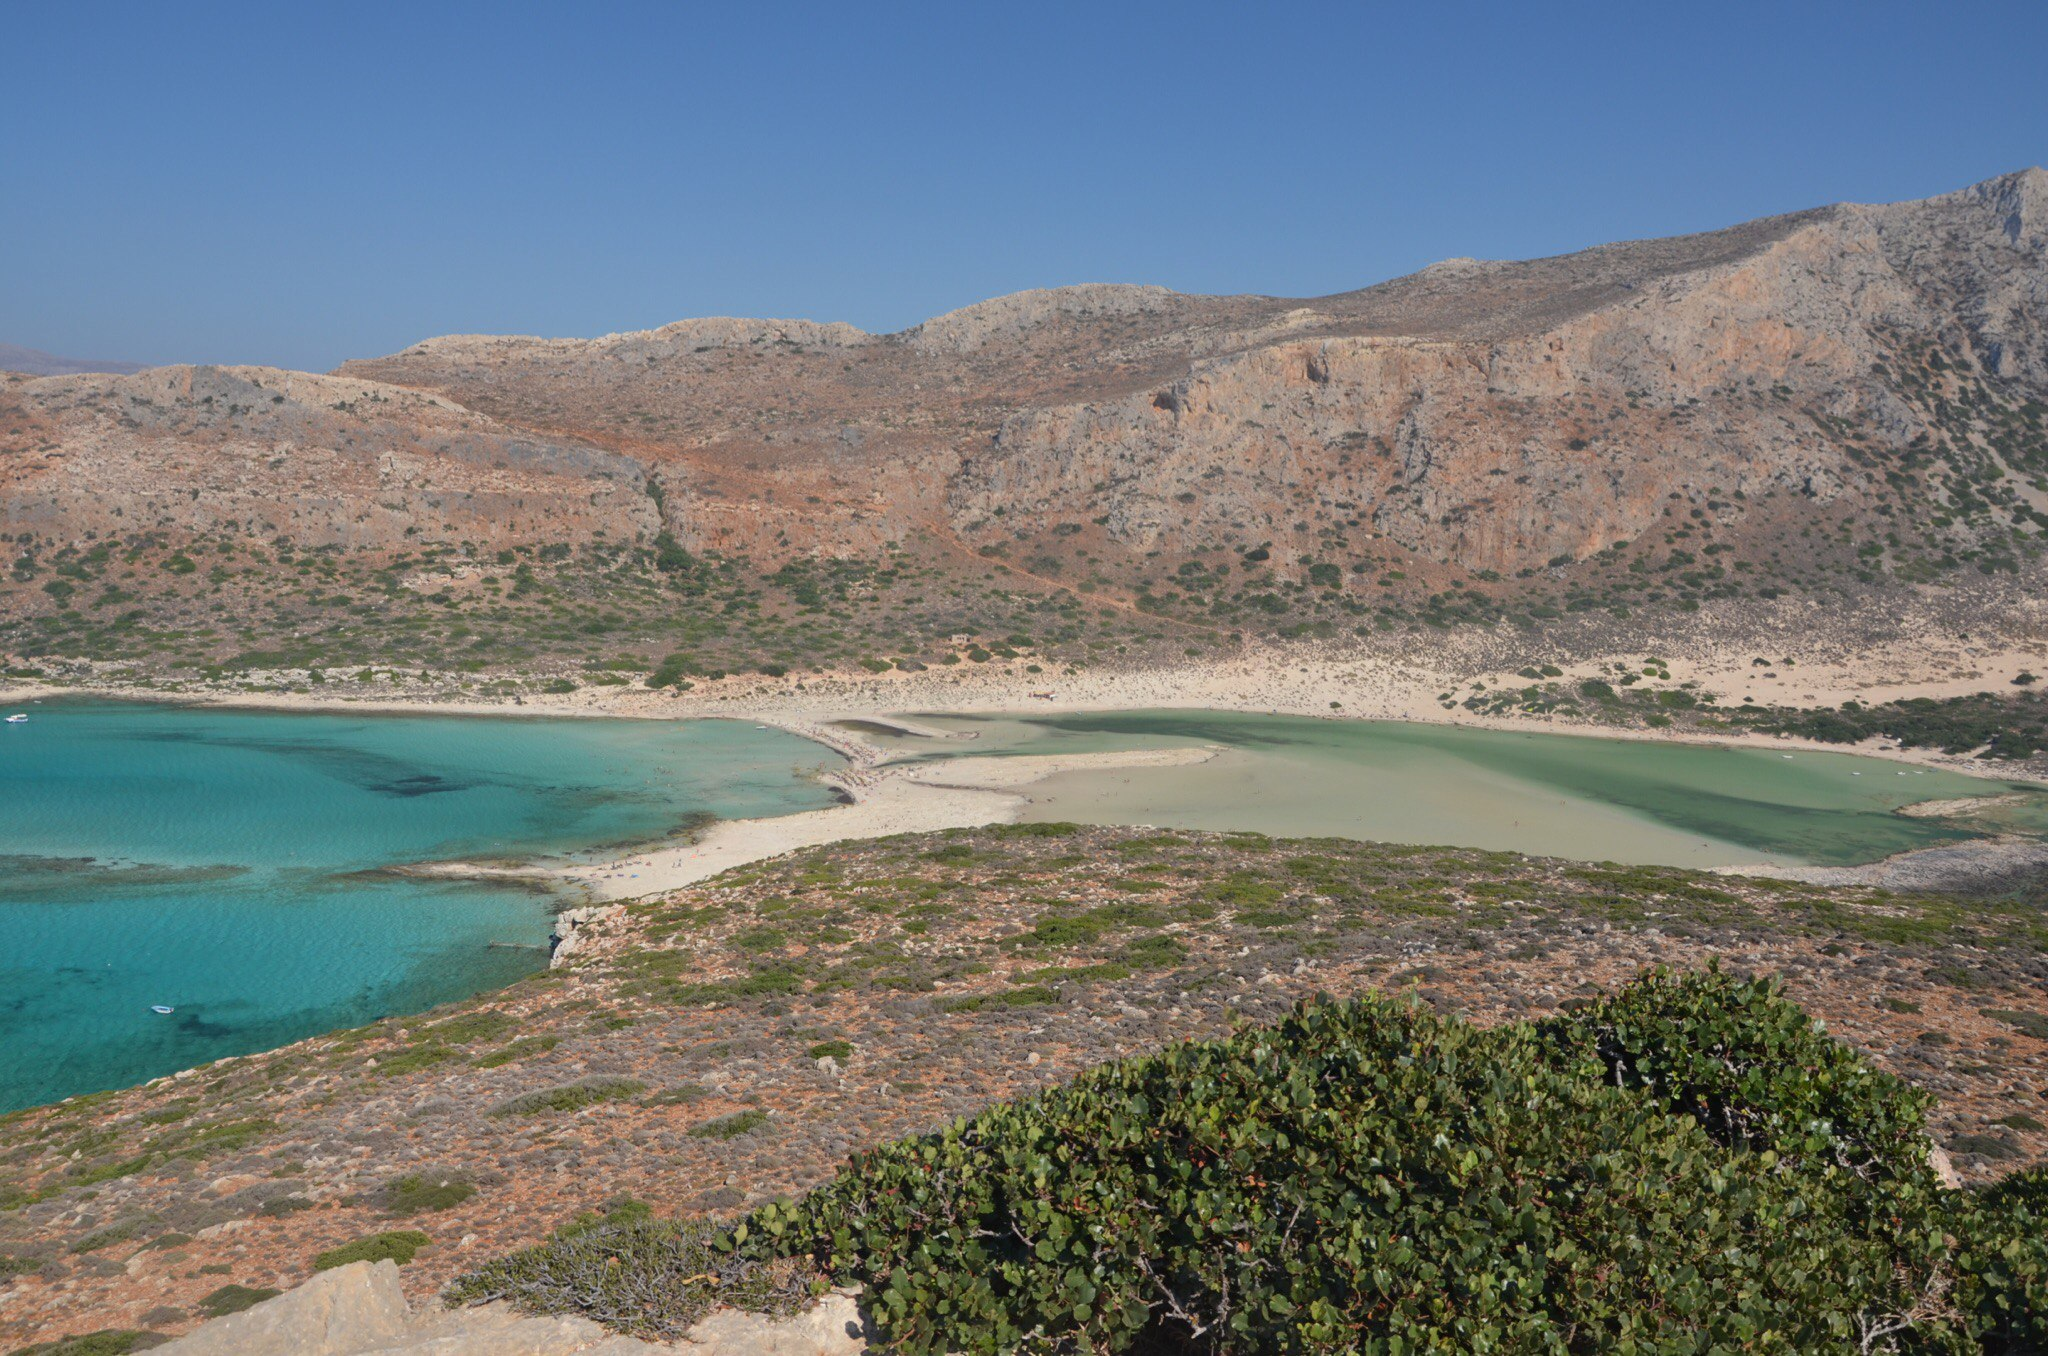 E3TScuiUwKg Балос - лучший пляж на Крите.